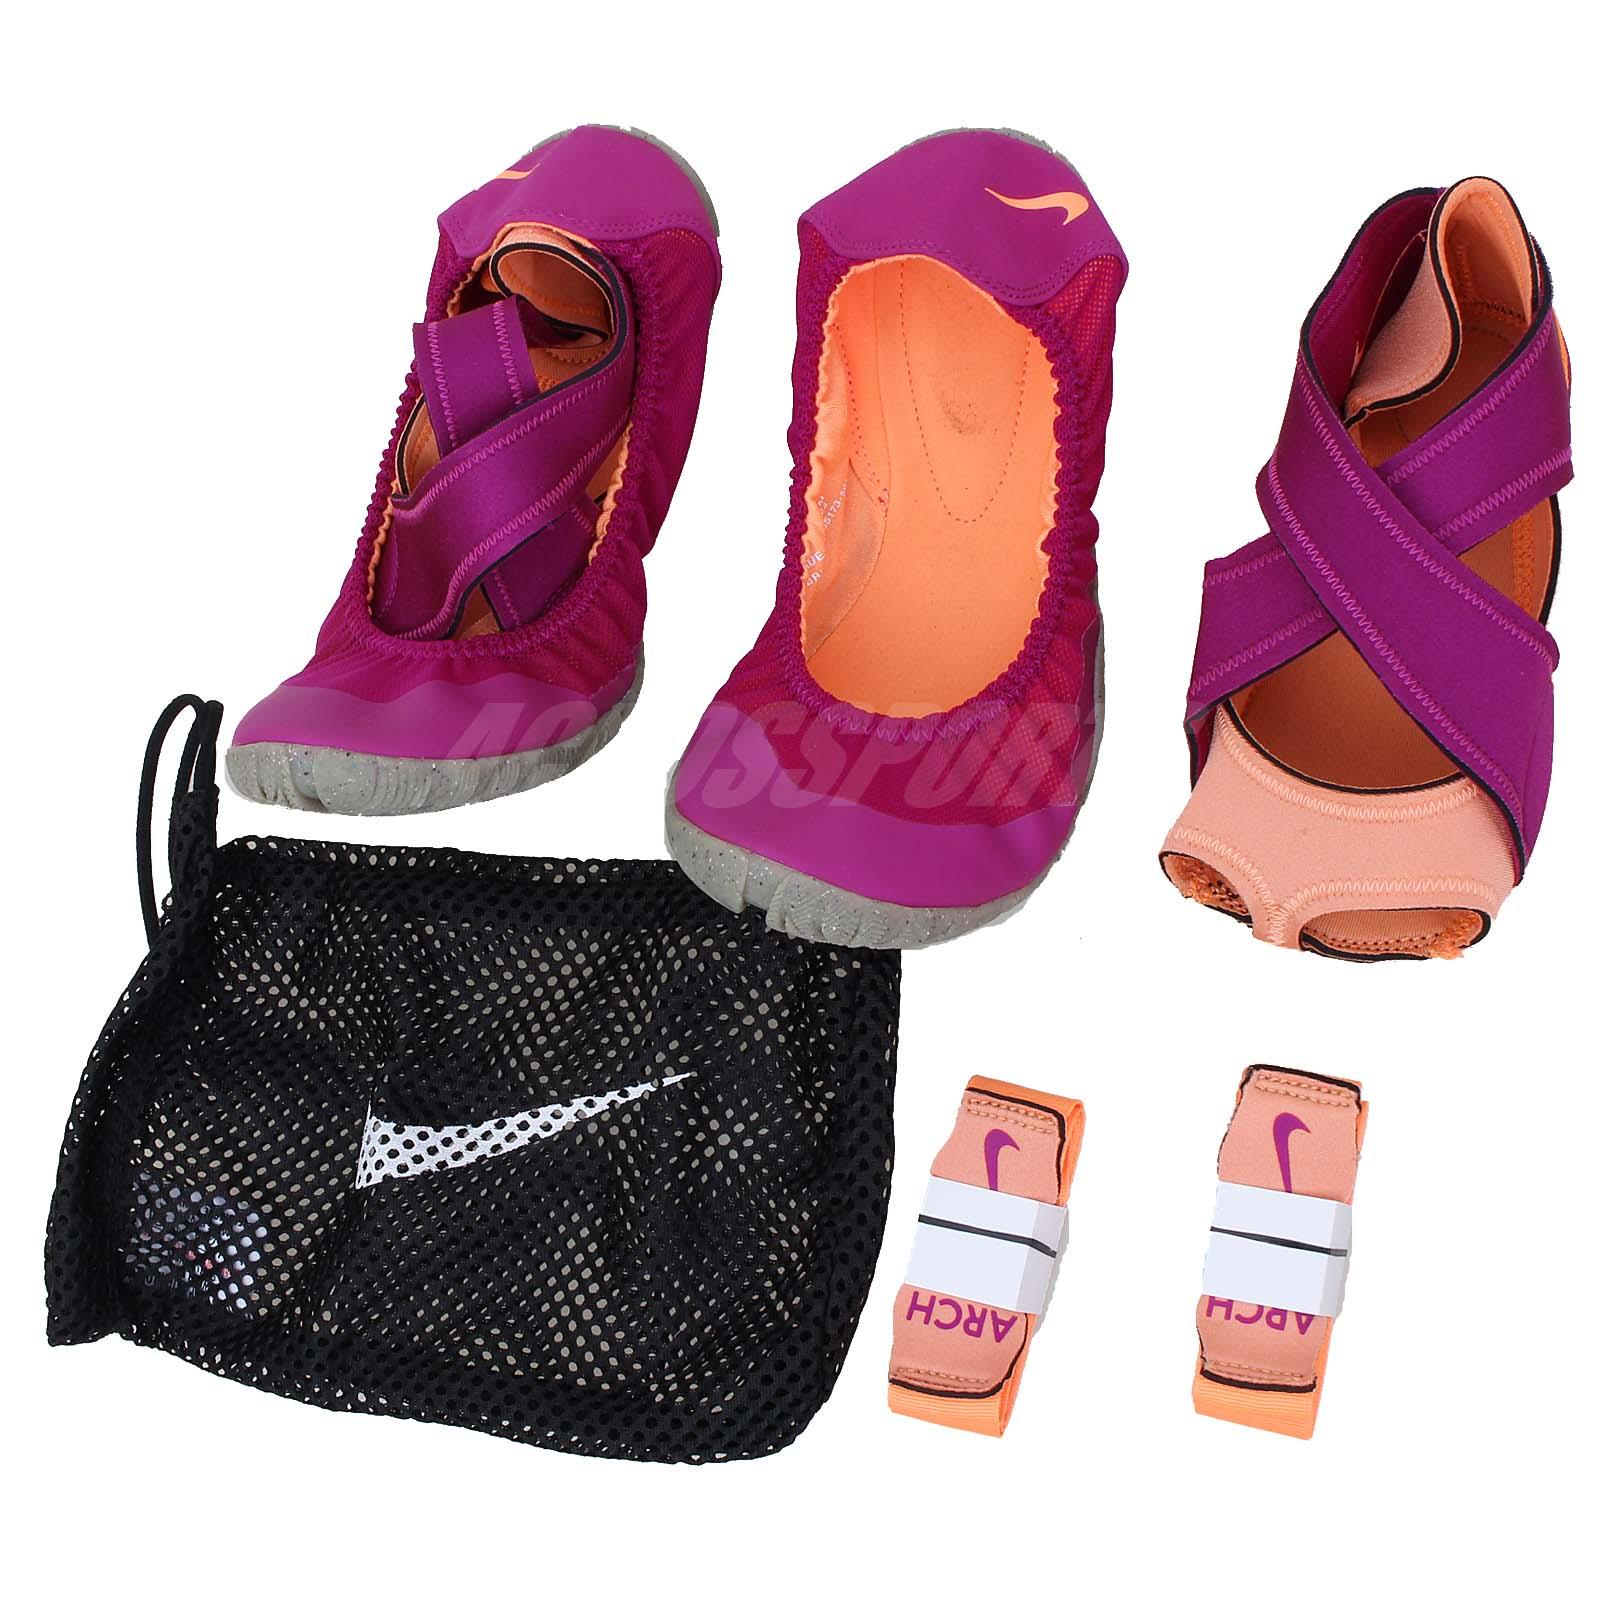 New  Nikecom9191316757nikezoommcwomensdanceshoereviewsreviews